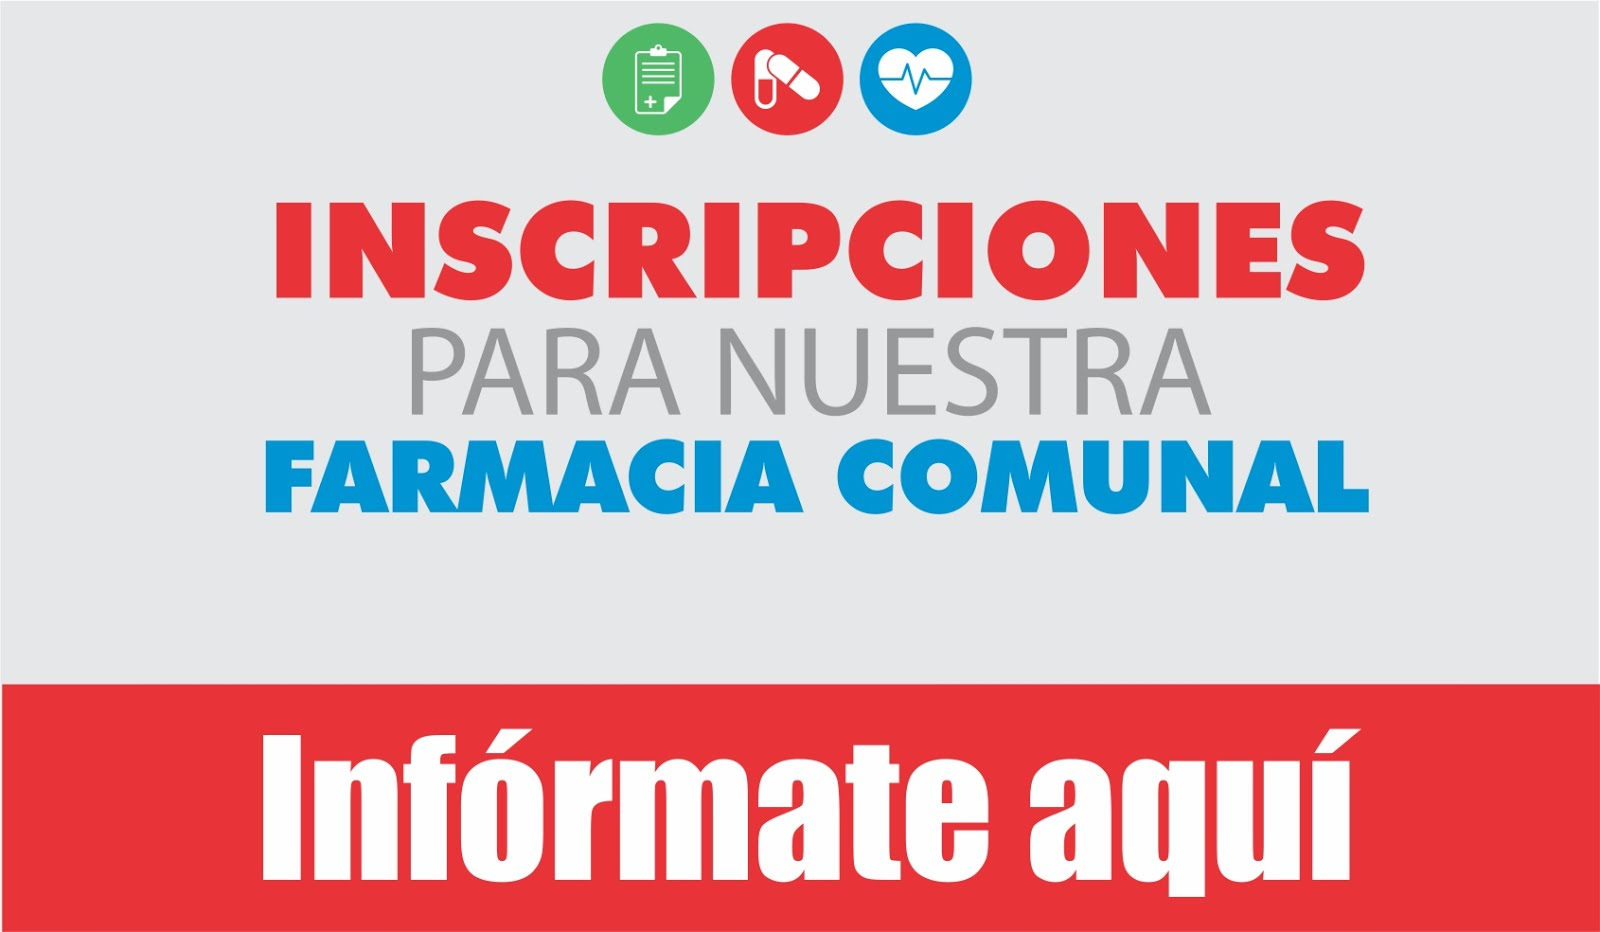 FARMACIA COMUNAL